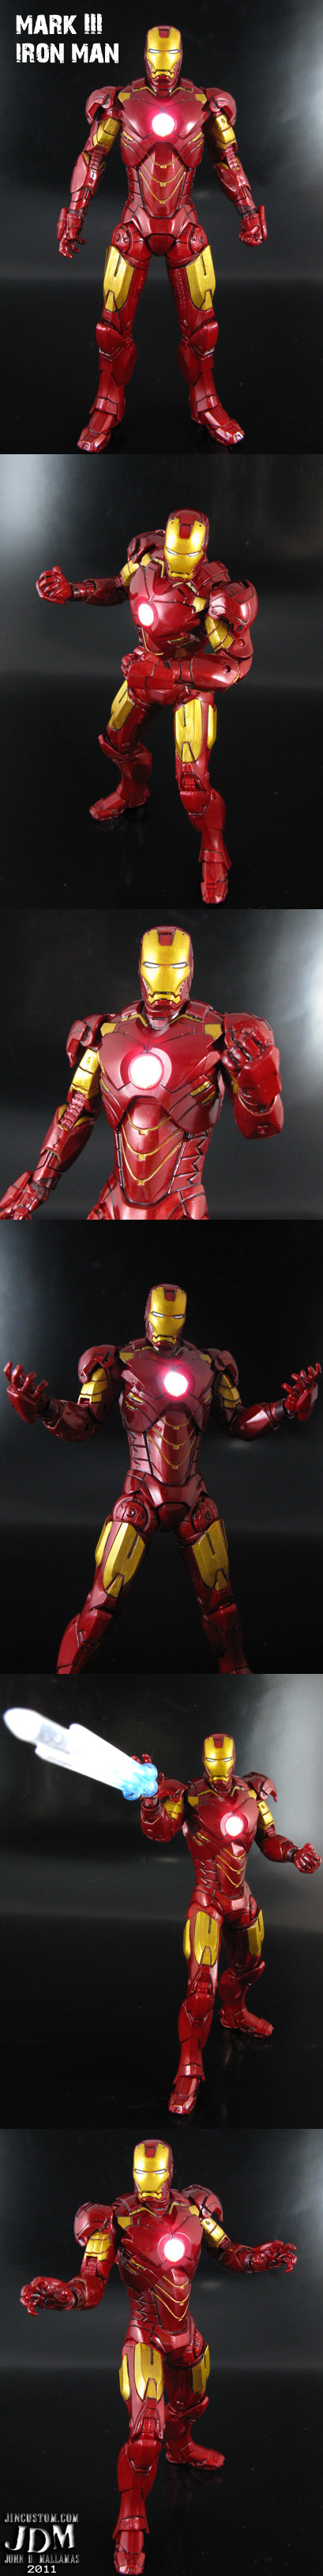 Mark IV Iron man